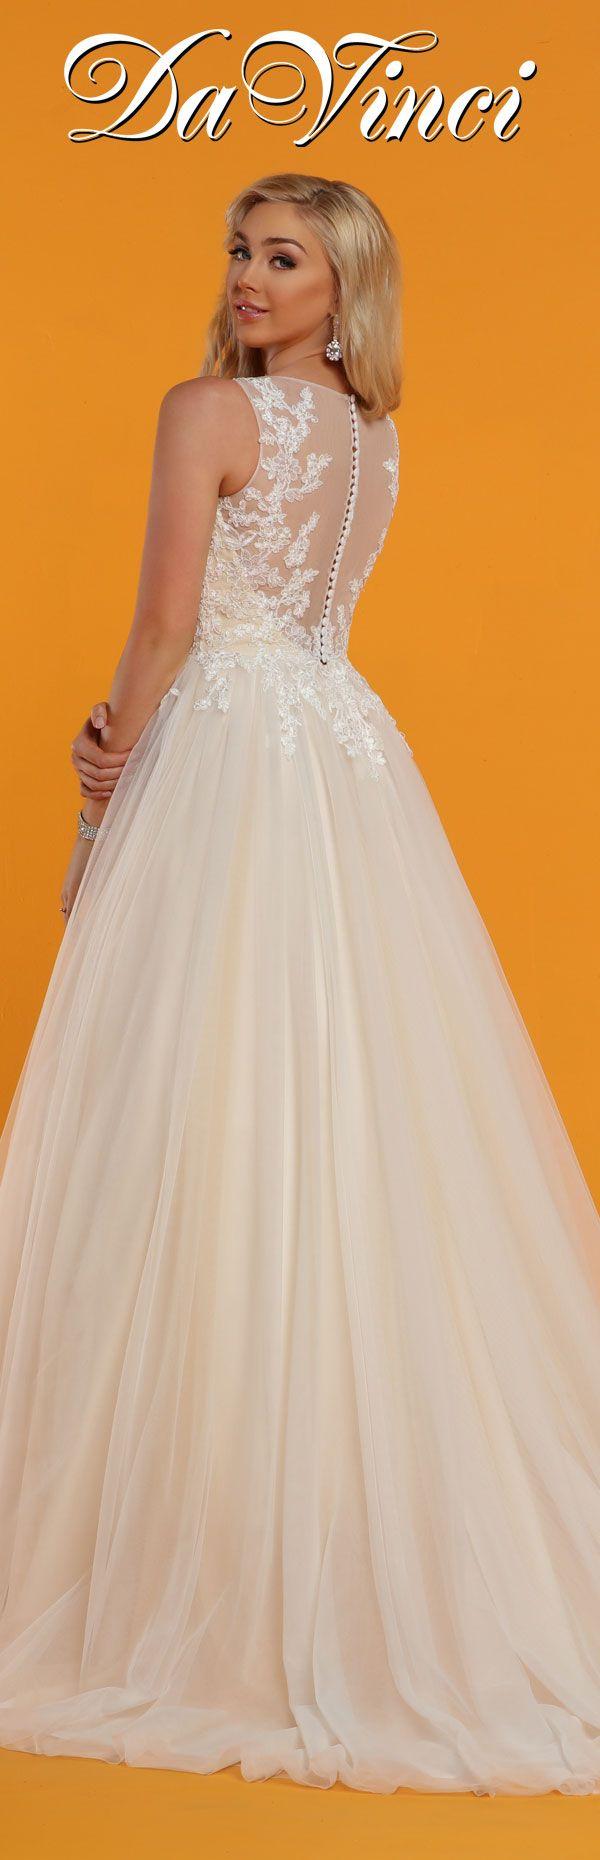 Davinci Bridal Style 50515 Wedding Gown Styles Bridal Dresses Online Davinci Wedding Dresses